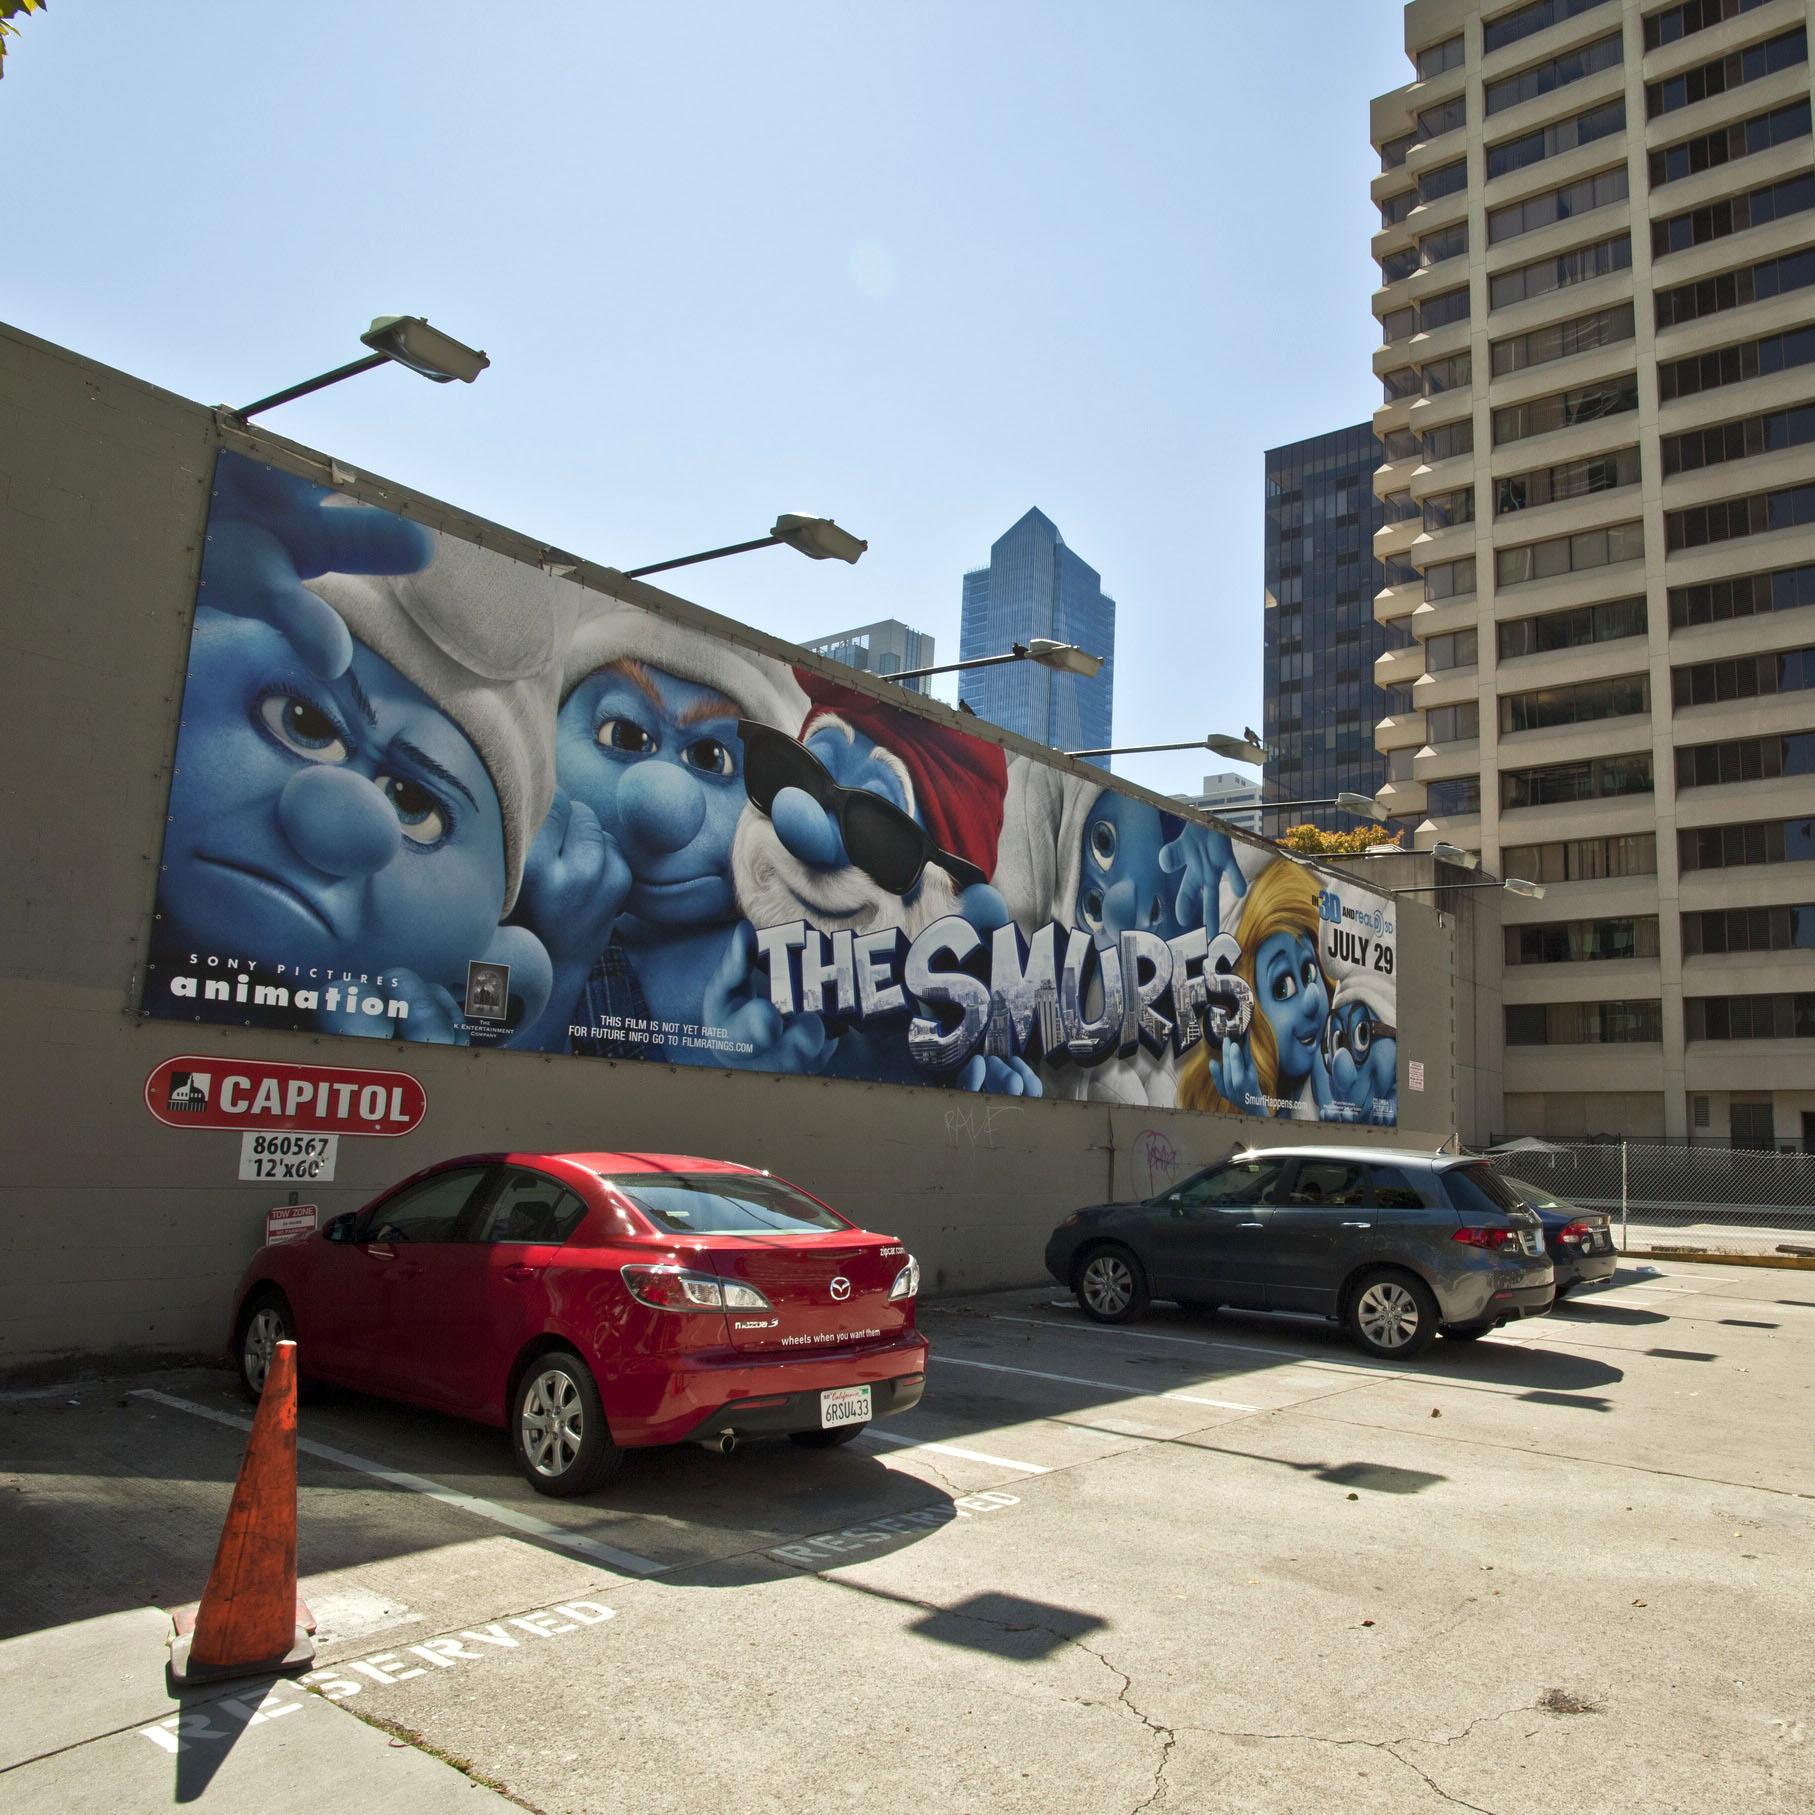 Advertising billboard The Smurfs along Folsom St San Francisco CA July 2011 01